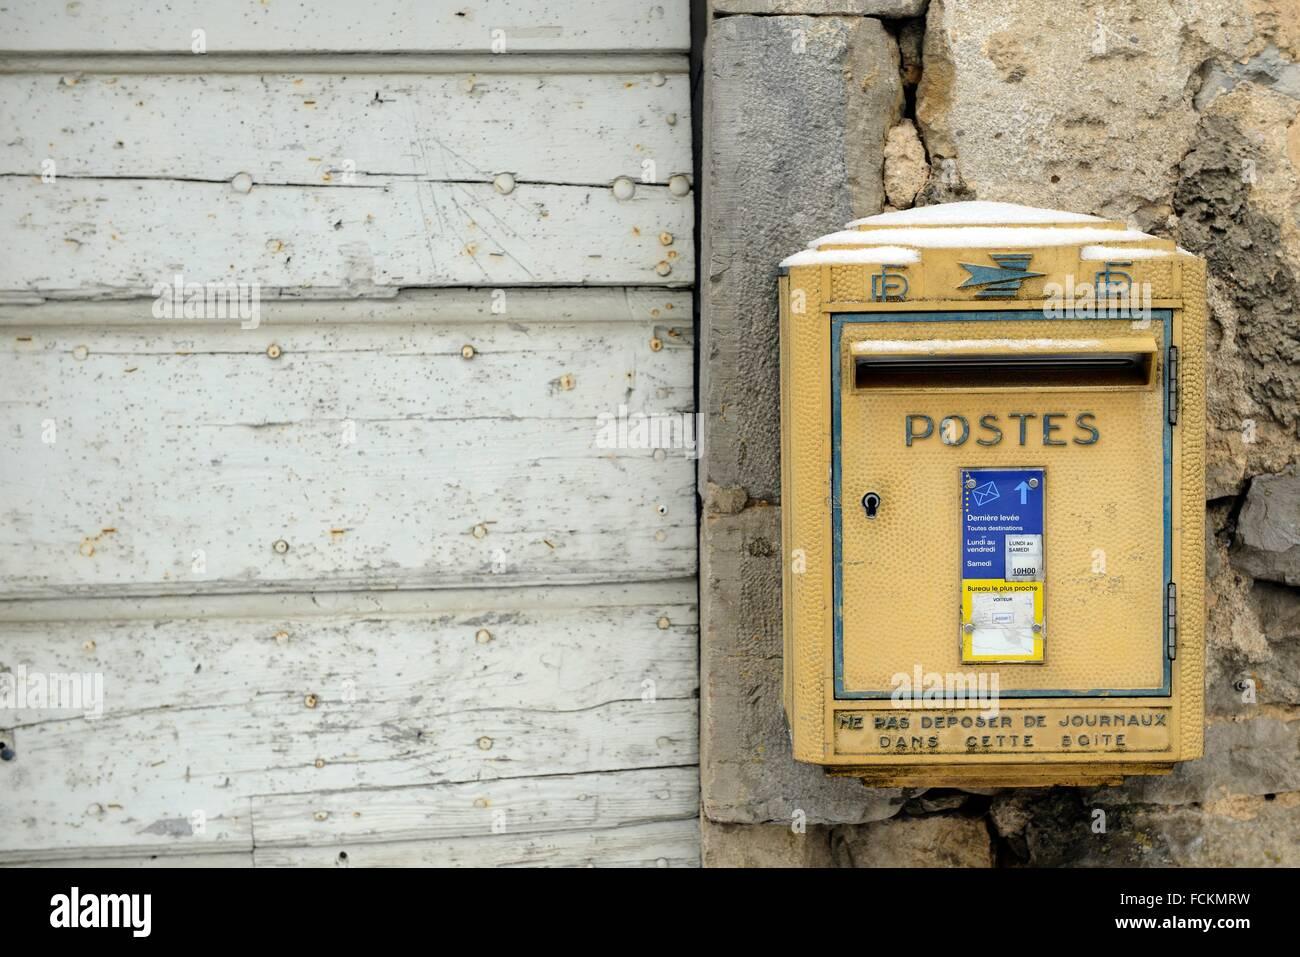 Bureau Architecture Jura : Mailbox in a old wall chateau chalon département du jura france